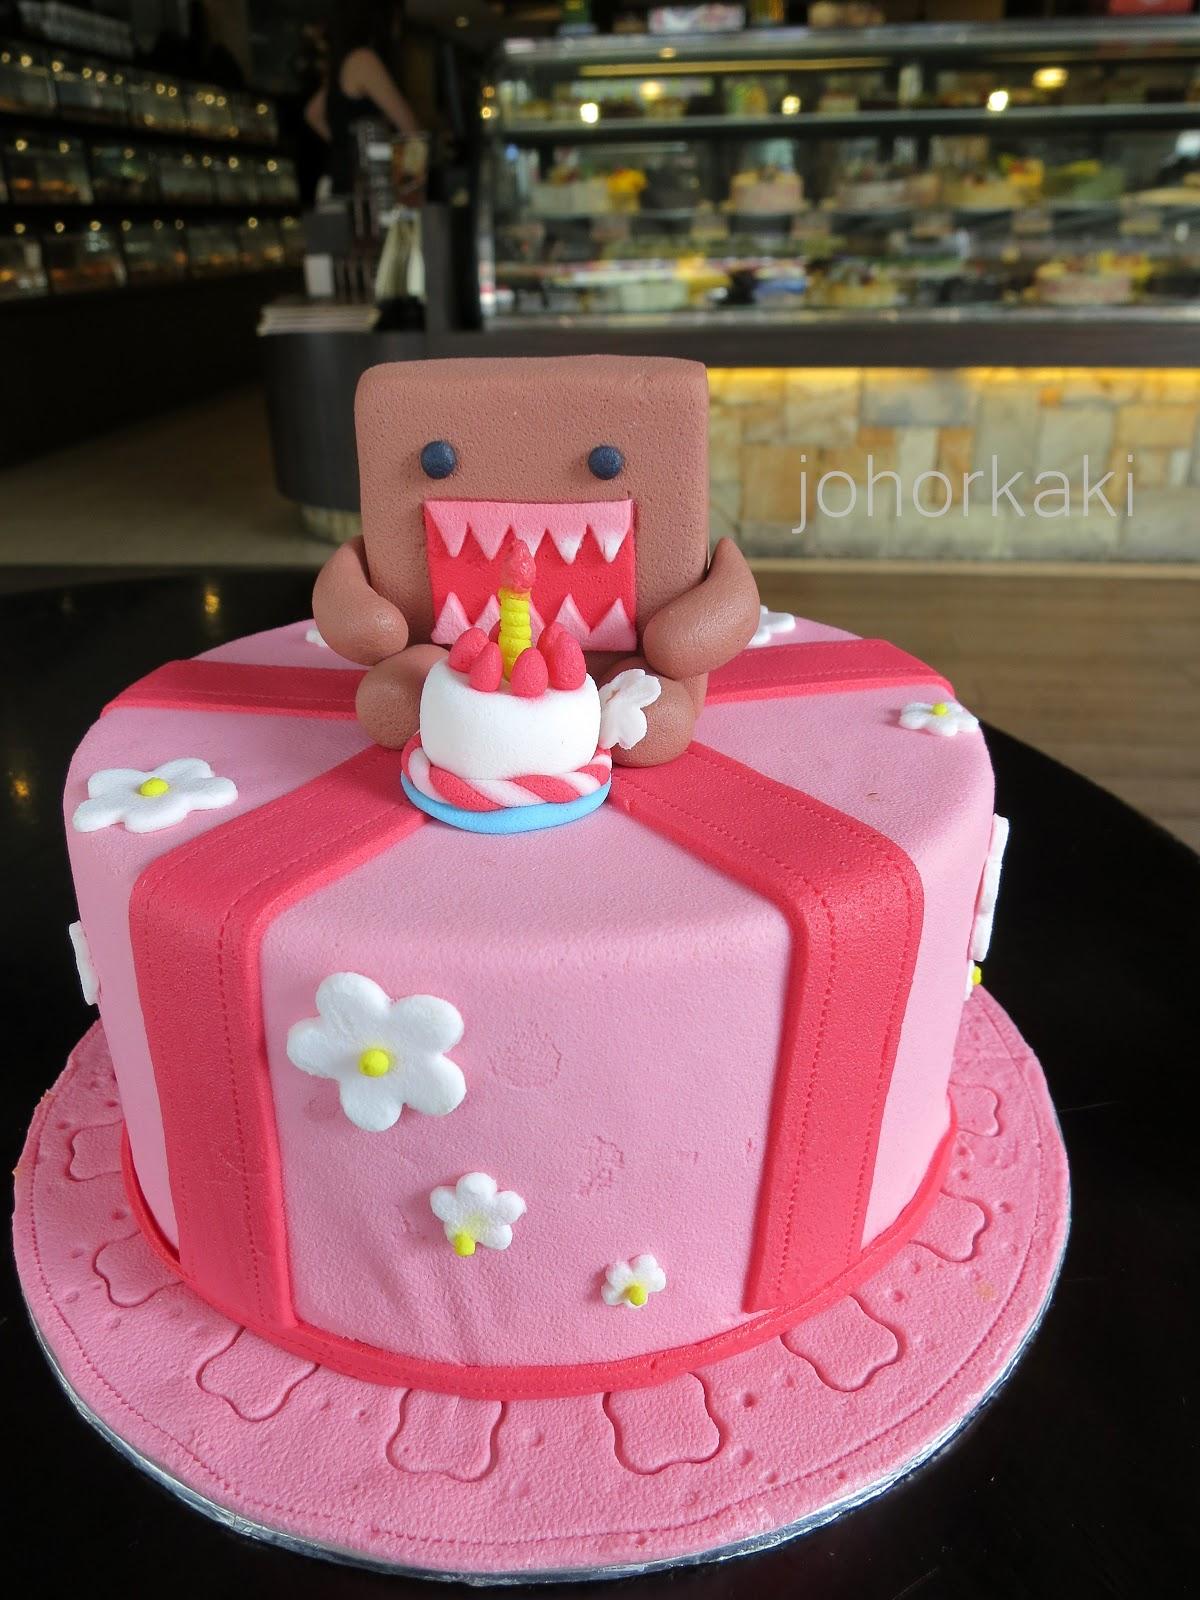 Designer Fondant Cakes By Moonlight Cake House In Johor Bahru Johor